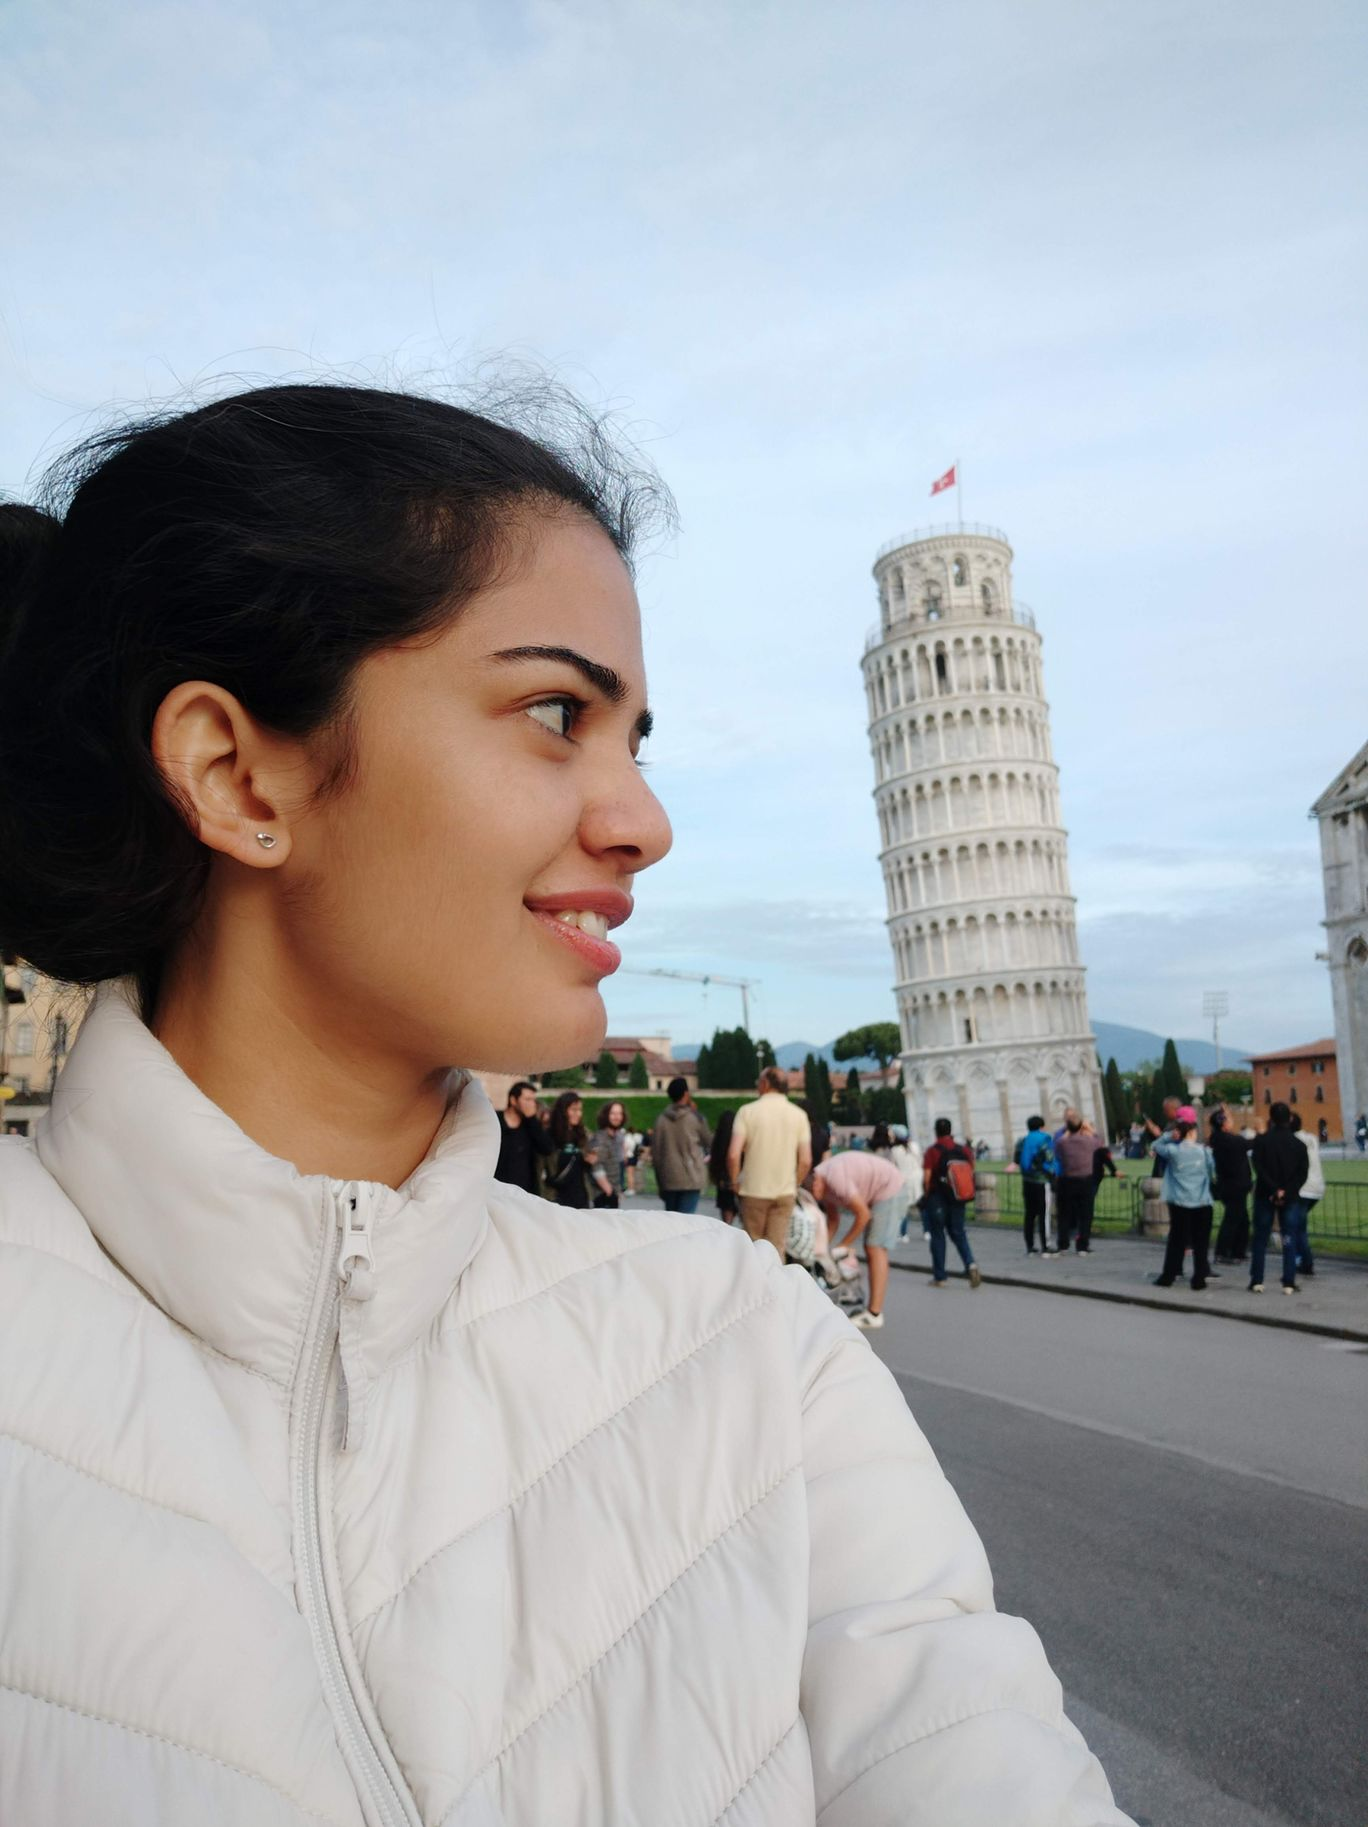 Photo of Pisa Tower By Nirmala Pk